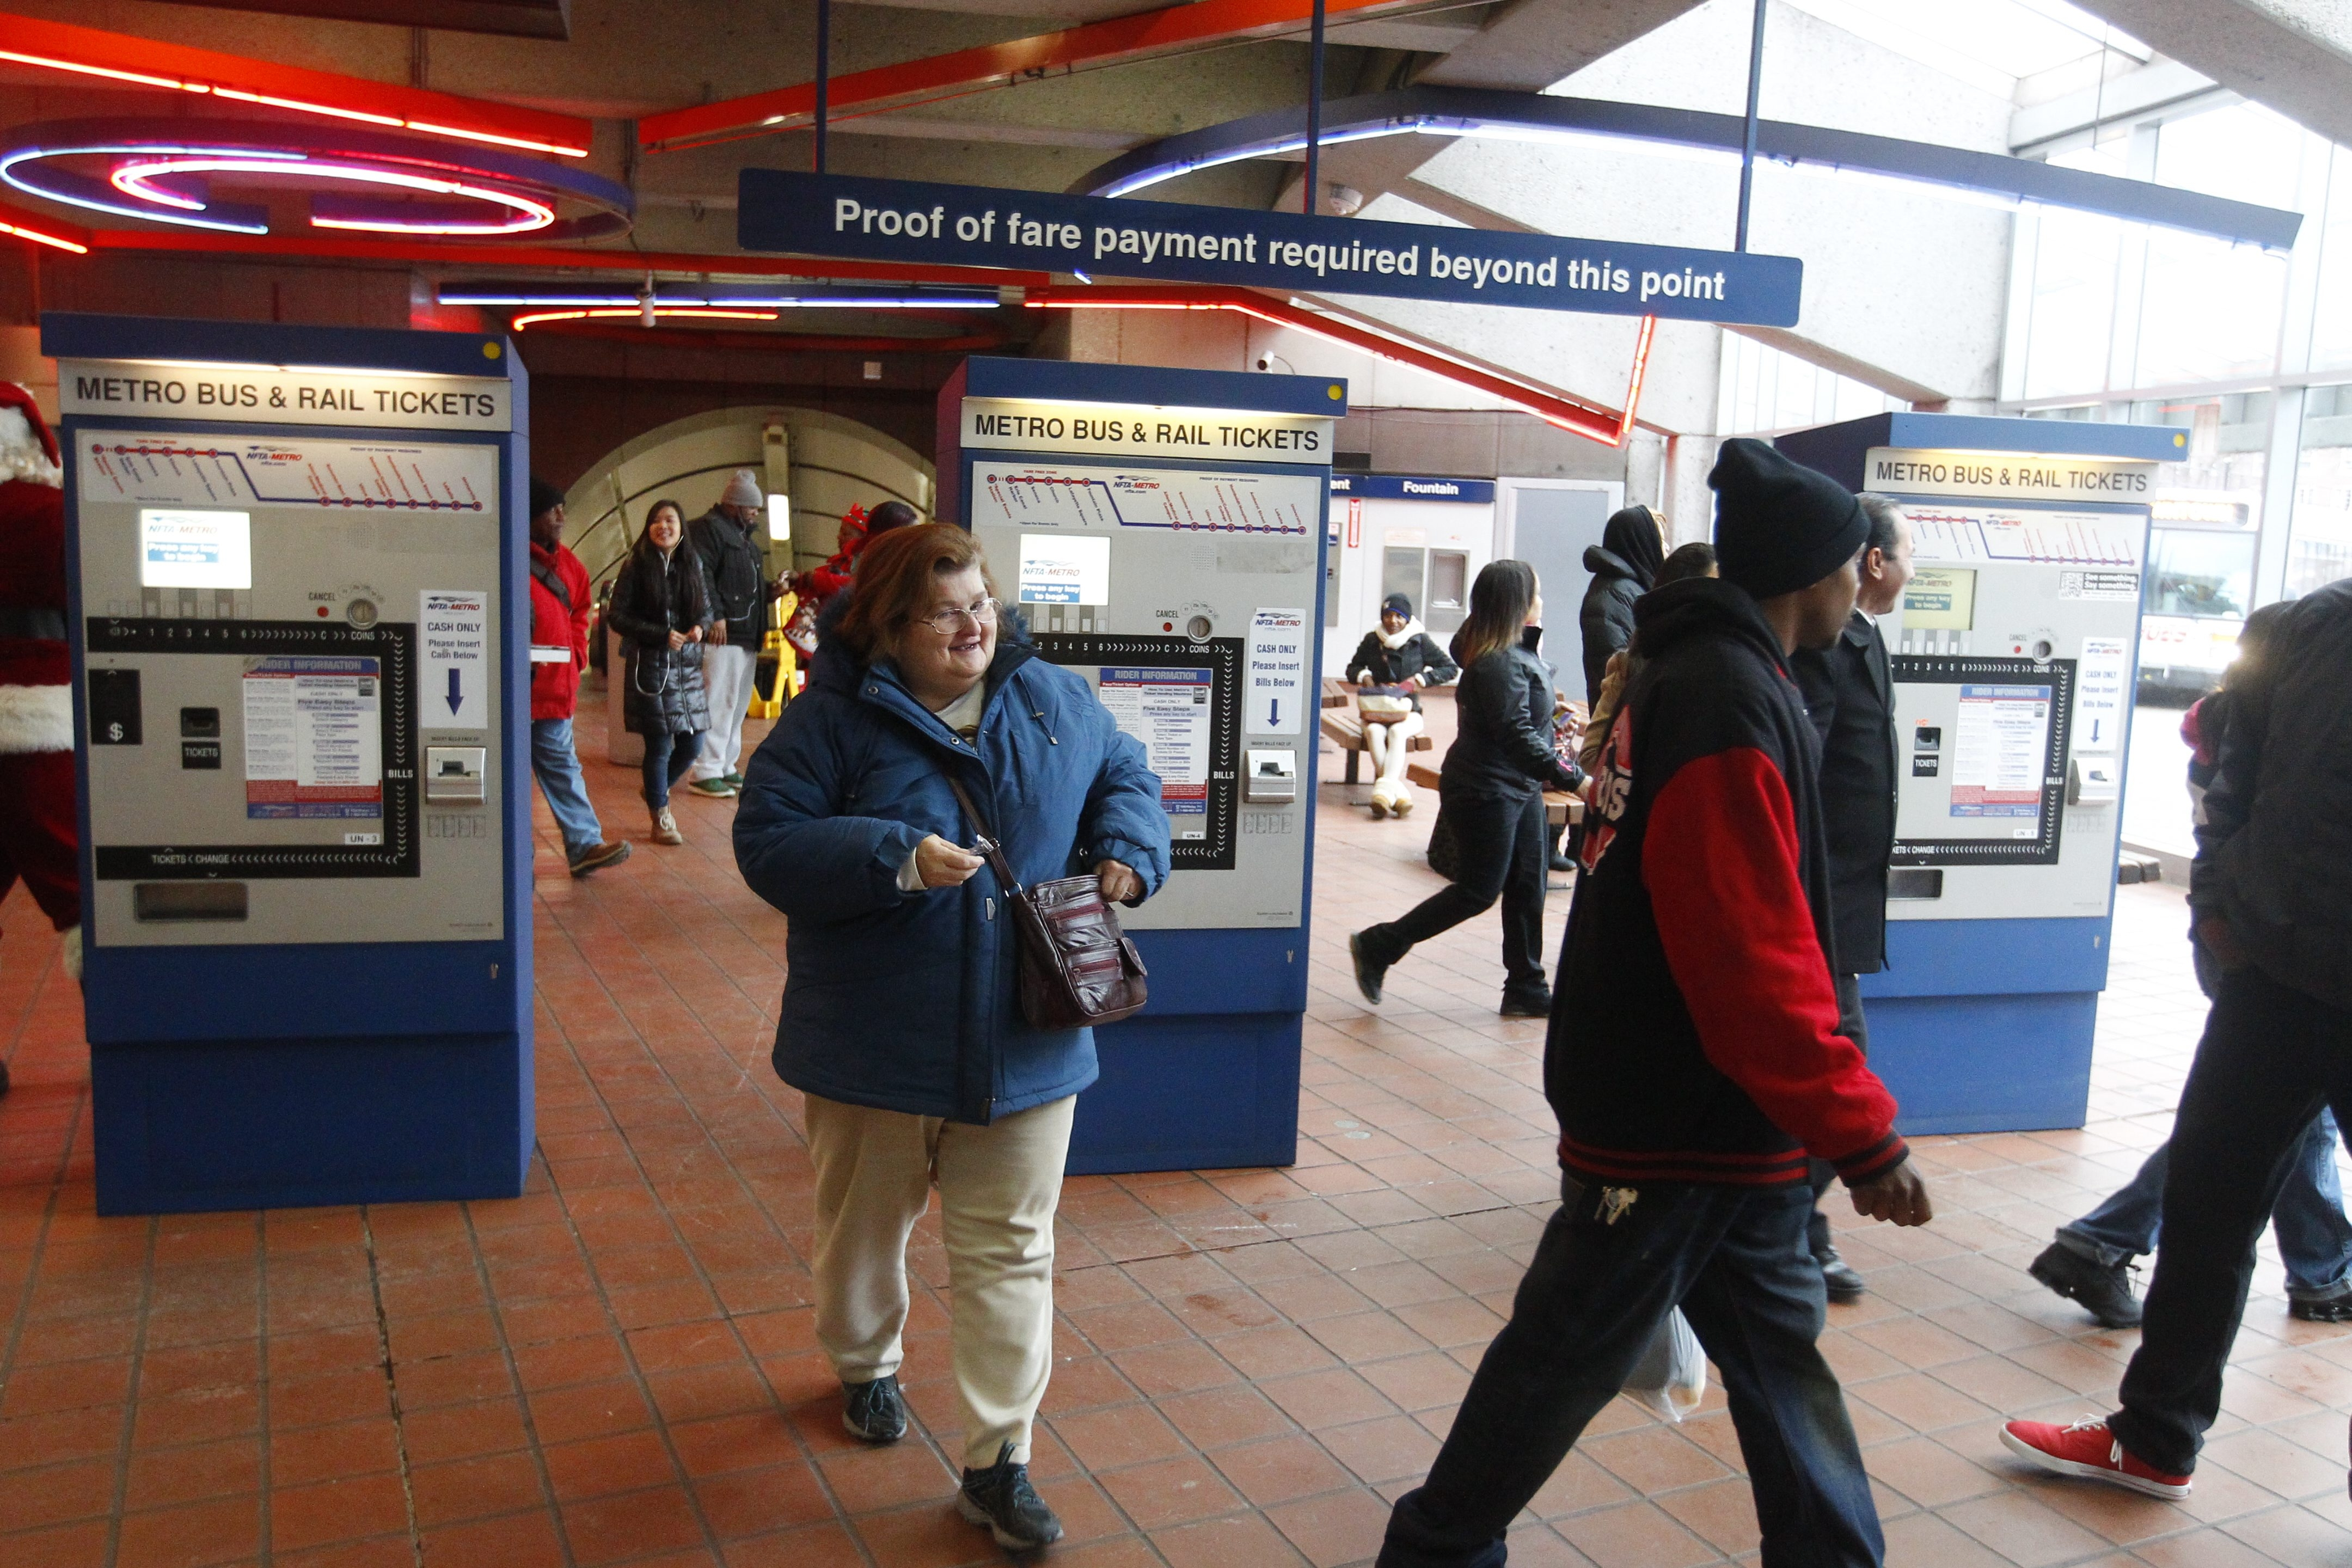 NFTA Metro Rail passengers exit past ticket machines on the upper level of the University Metro Rail Station in Buffalo on Thursday.